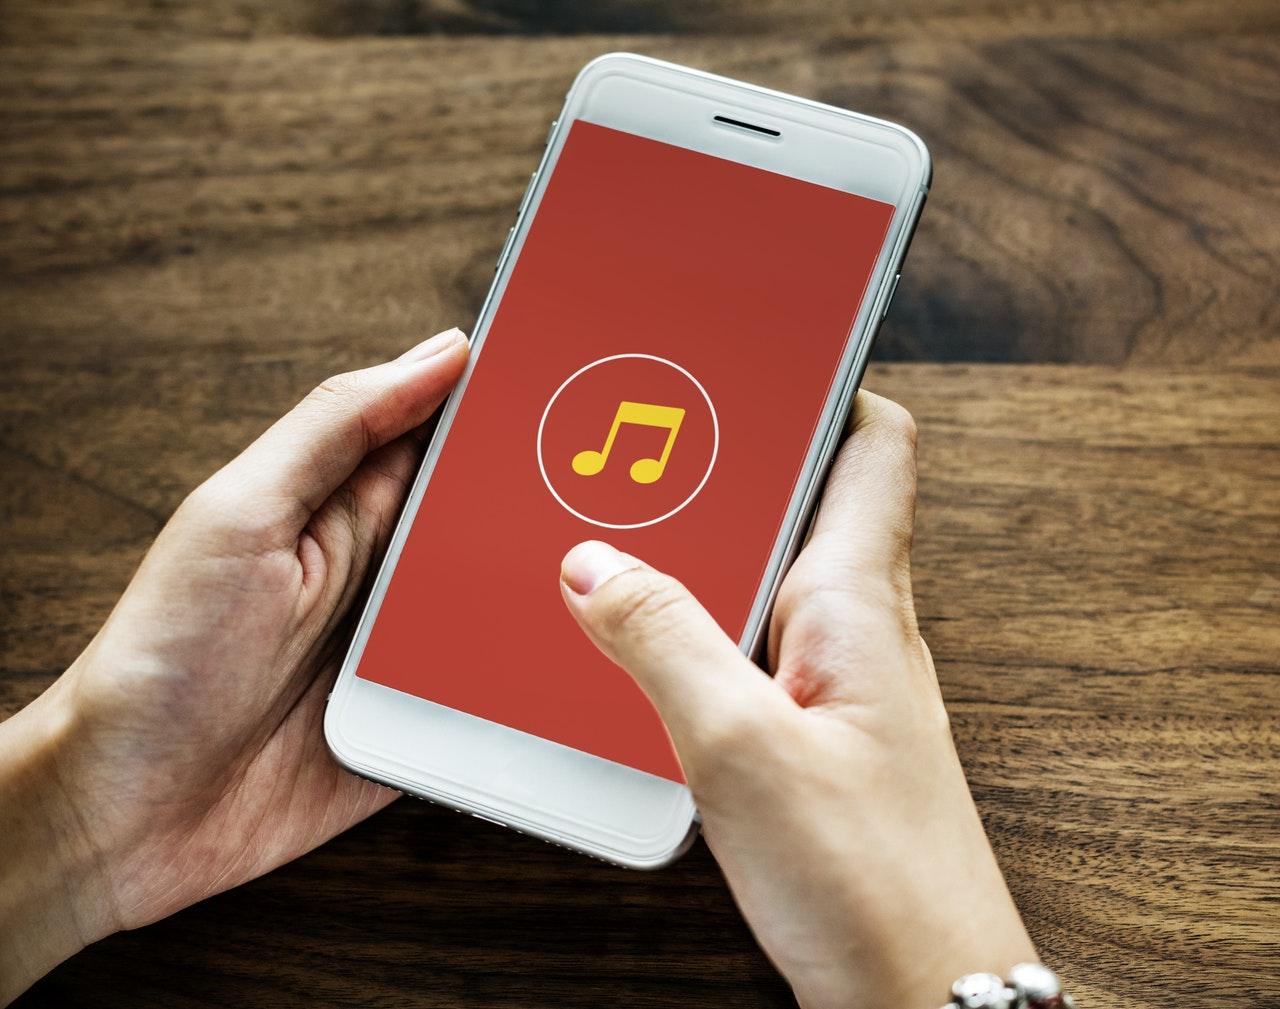 iPhoneで楽しめる音楽系アプリ特集 アプリで音楽の可能性を広げよう!